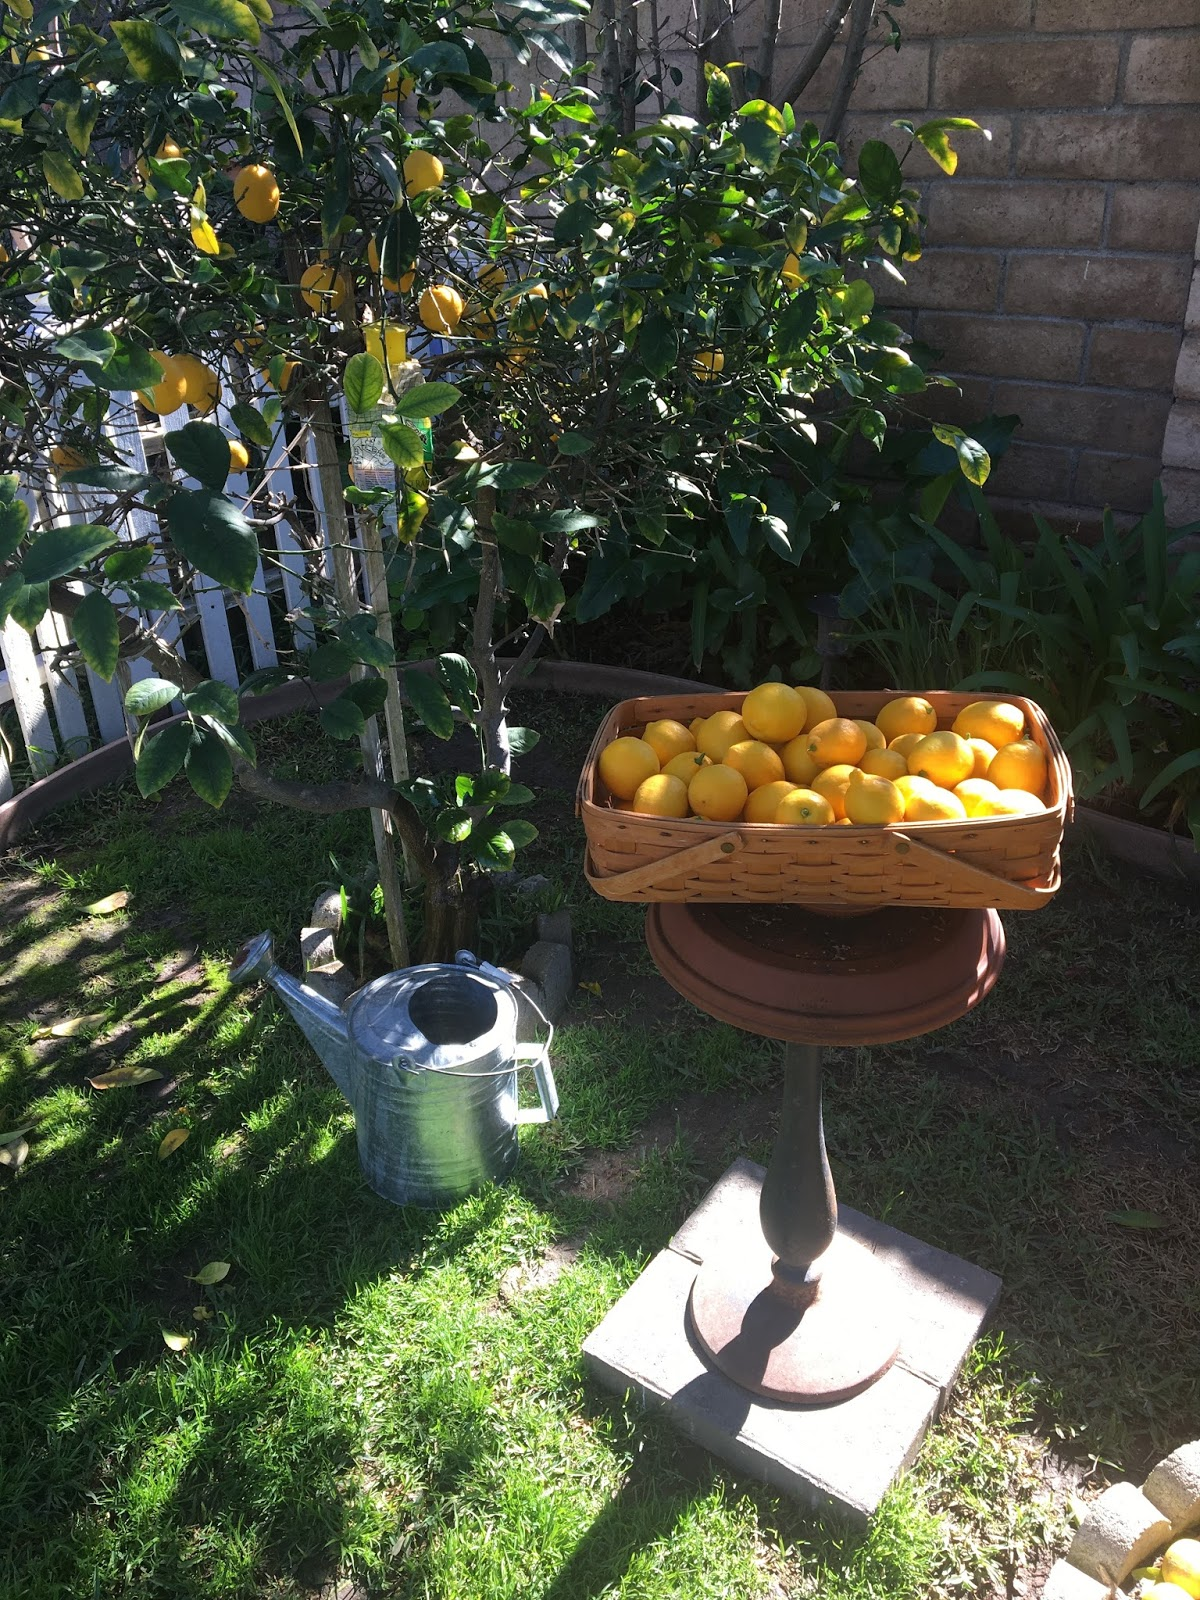 wild oak designs when life gives you lemons